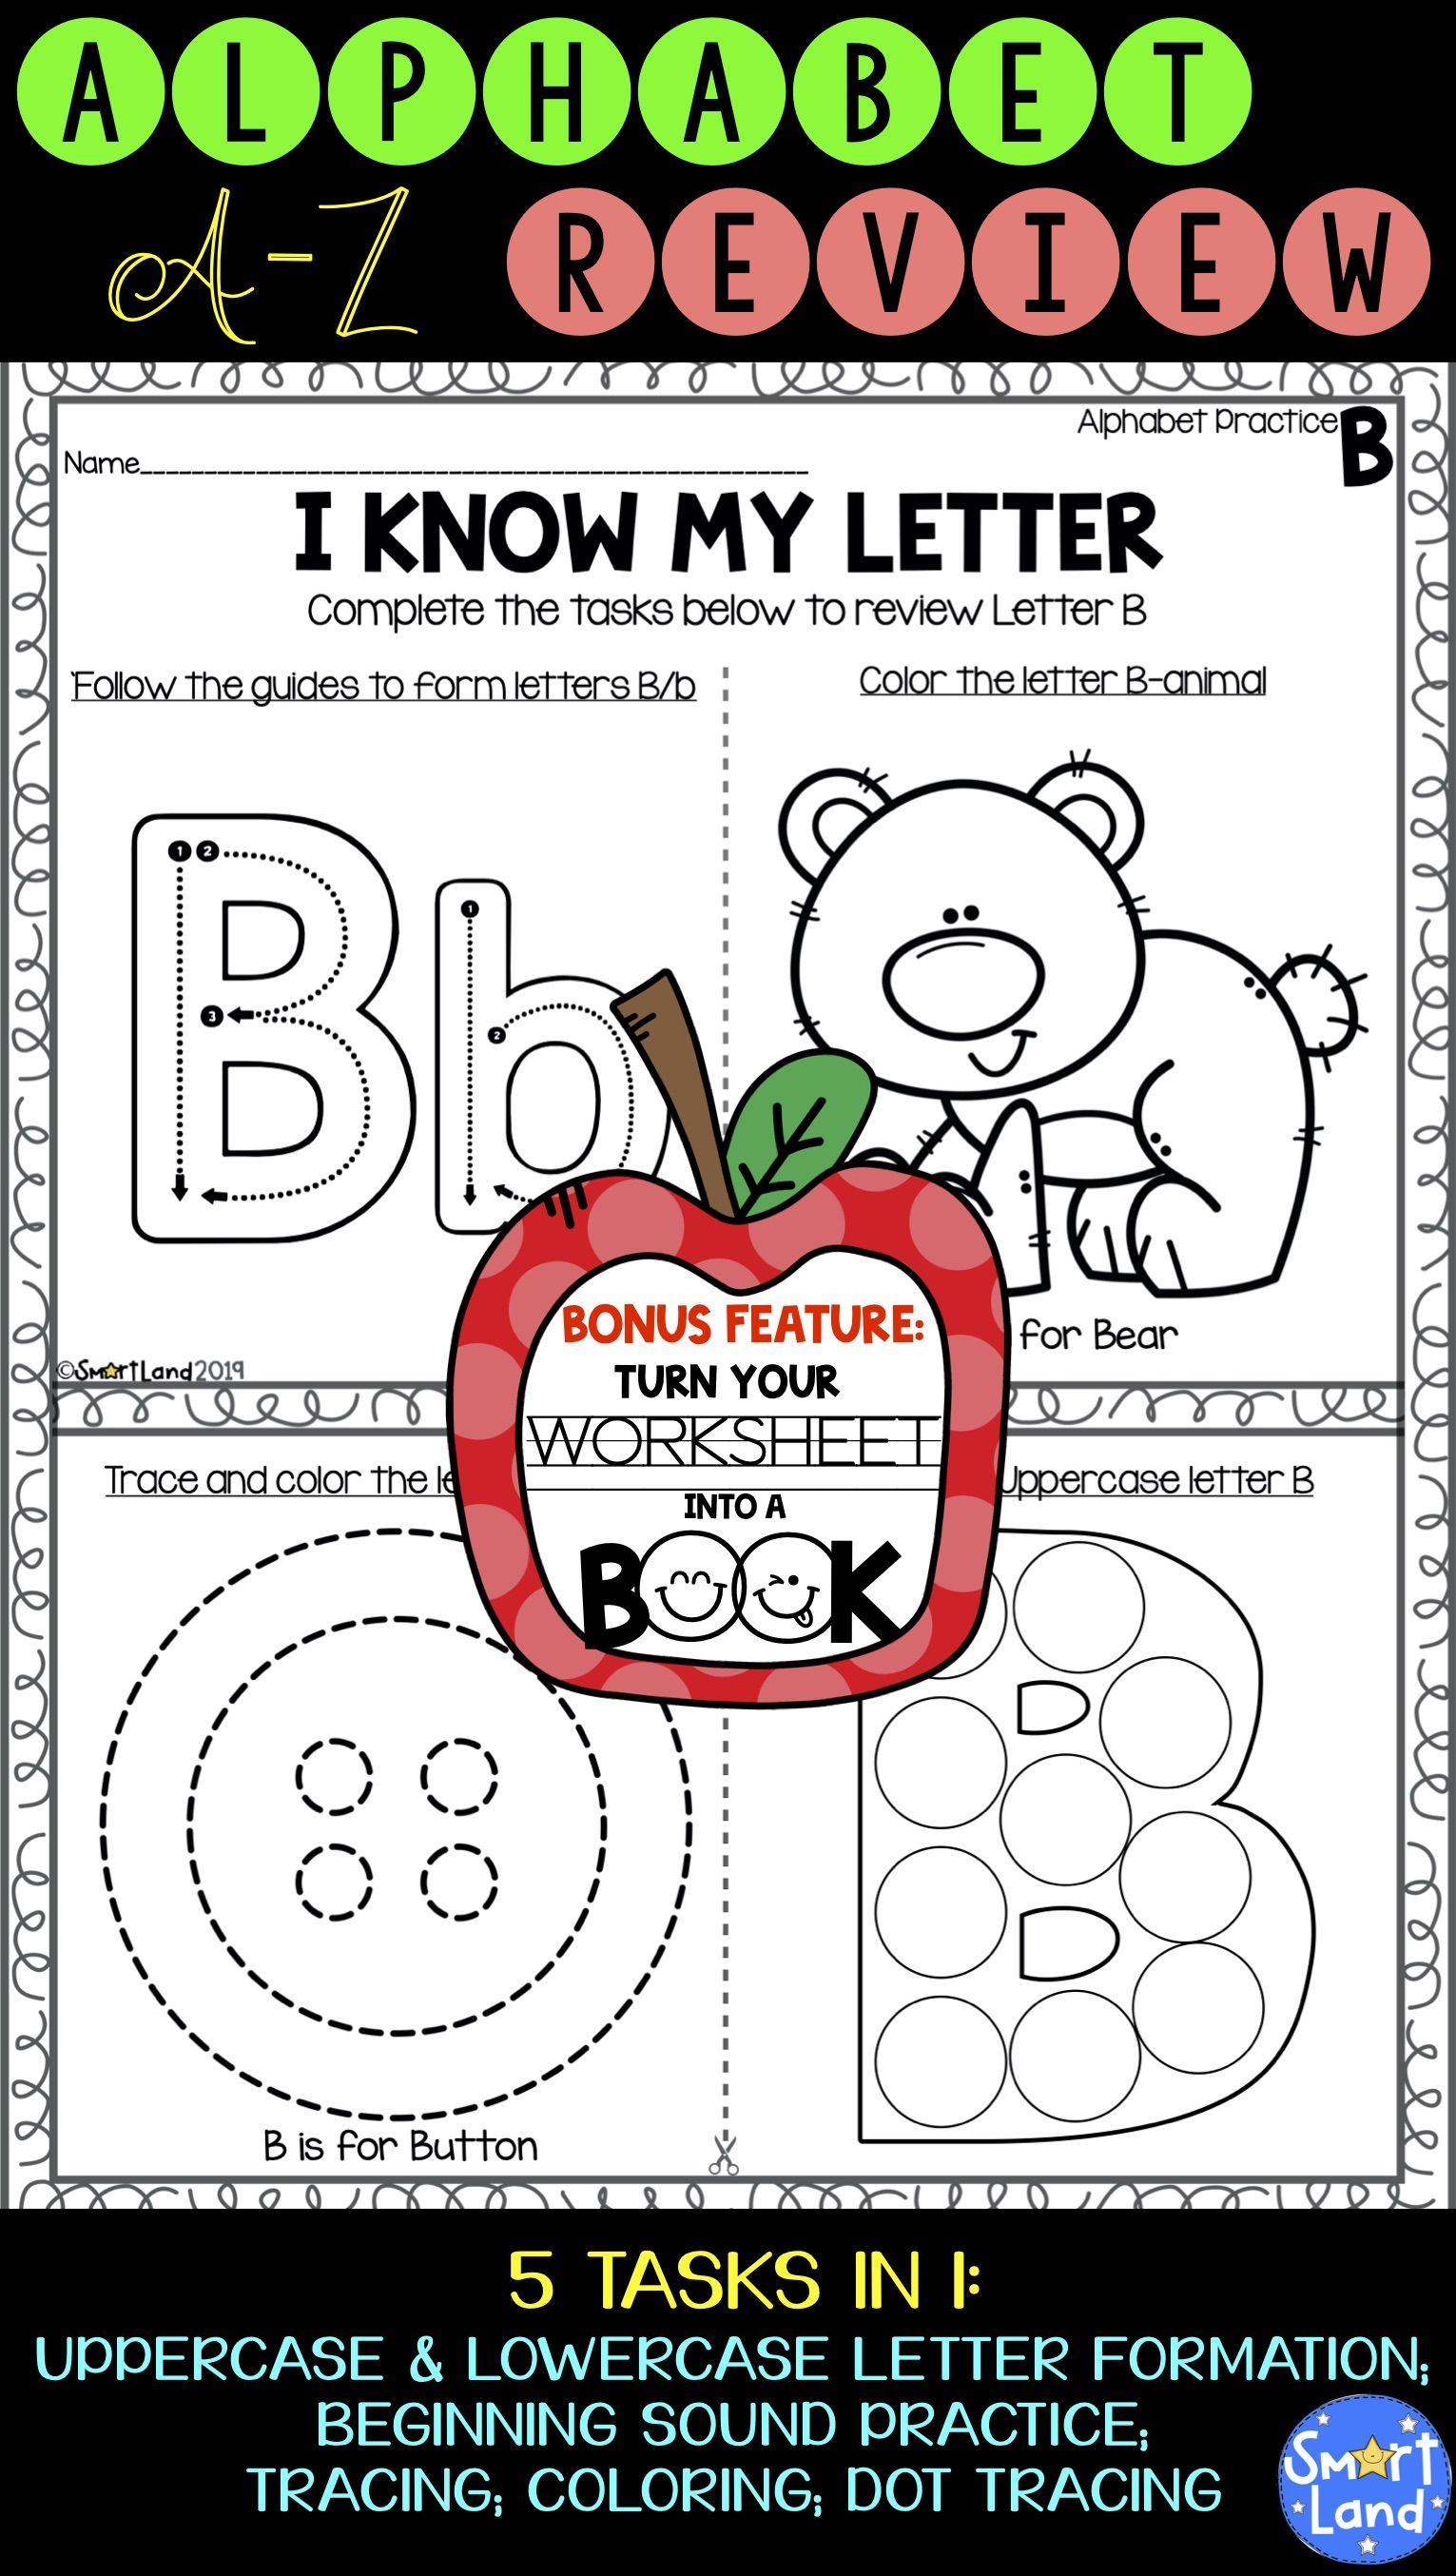 Alphabet Practice 2in1 Review Book